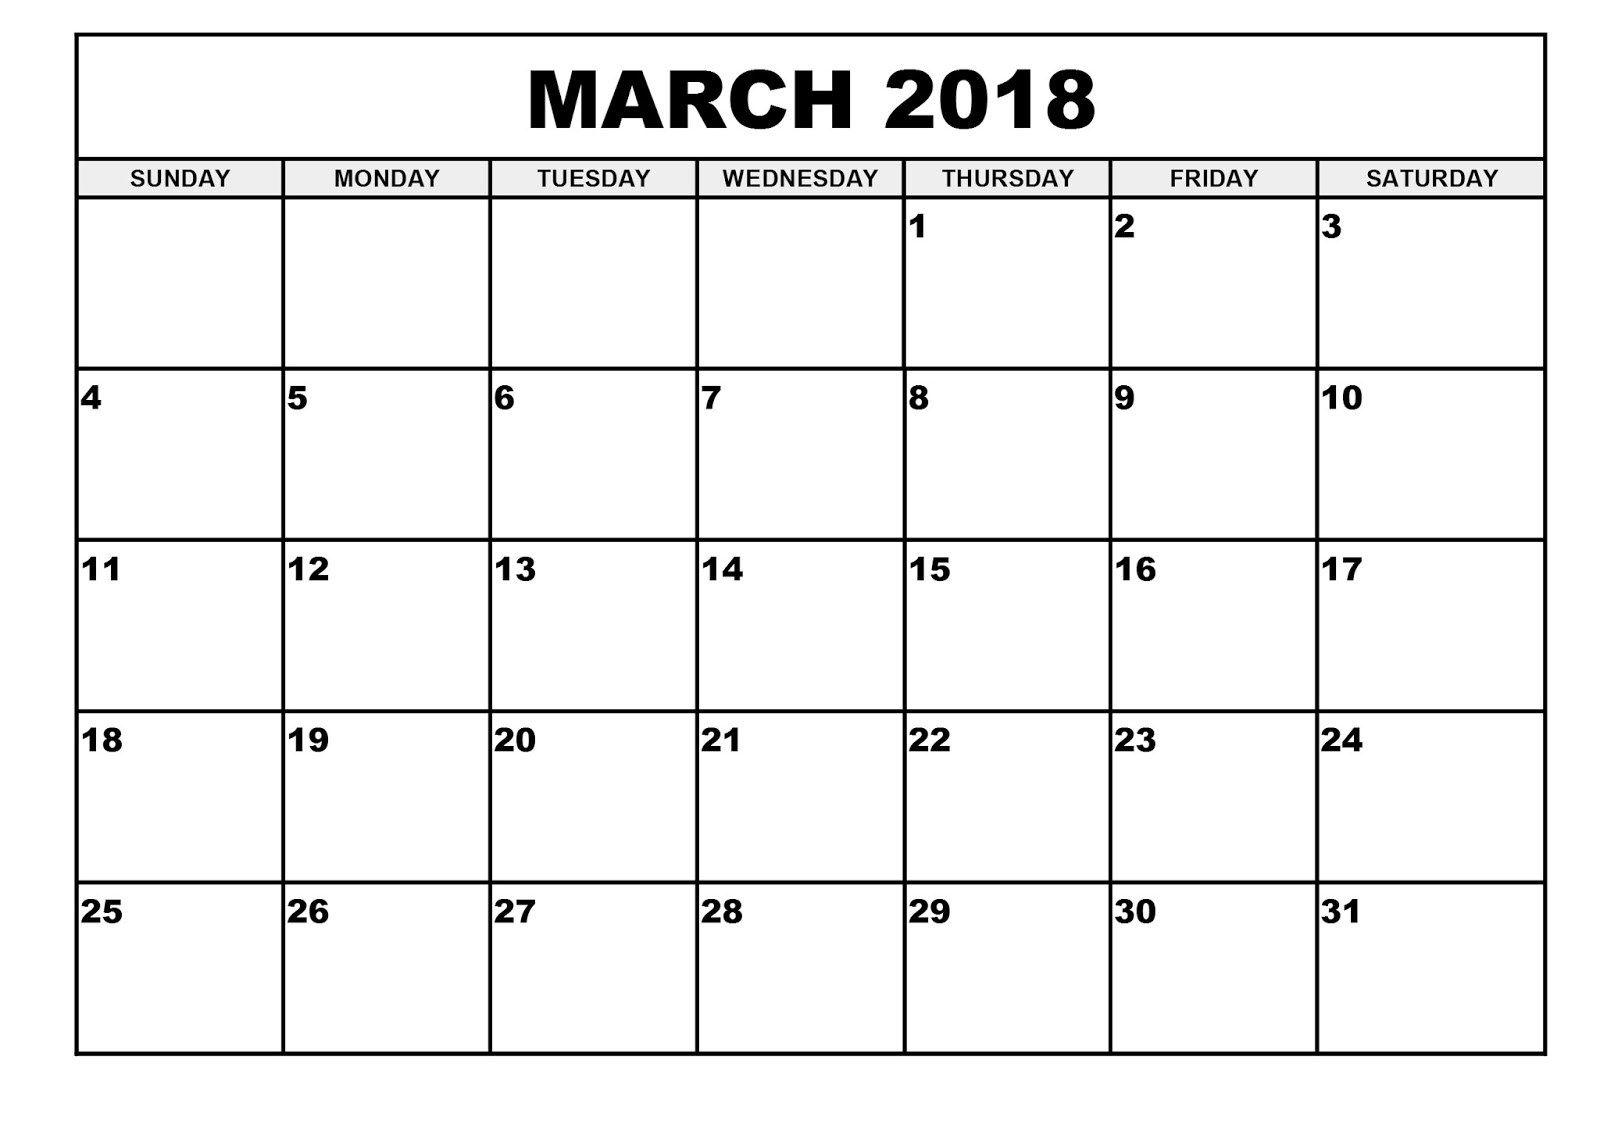 March 2018 calendar | March 2018 Calendar | Pinterest | March, Calendar printable and Holidays